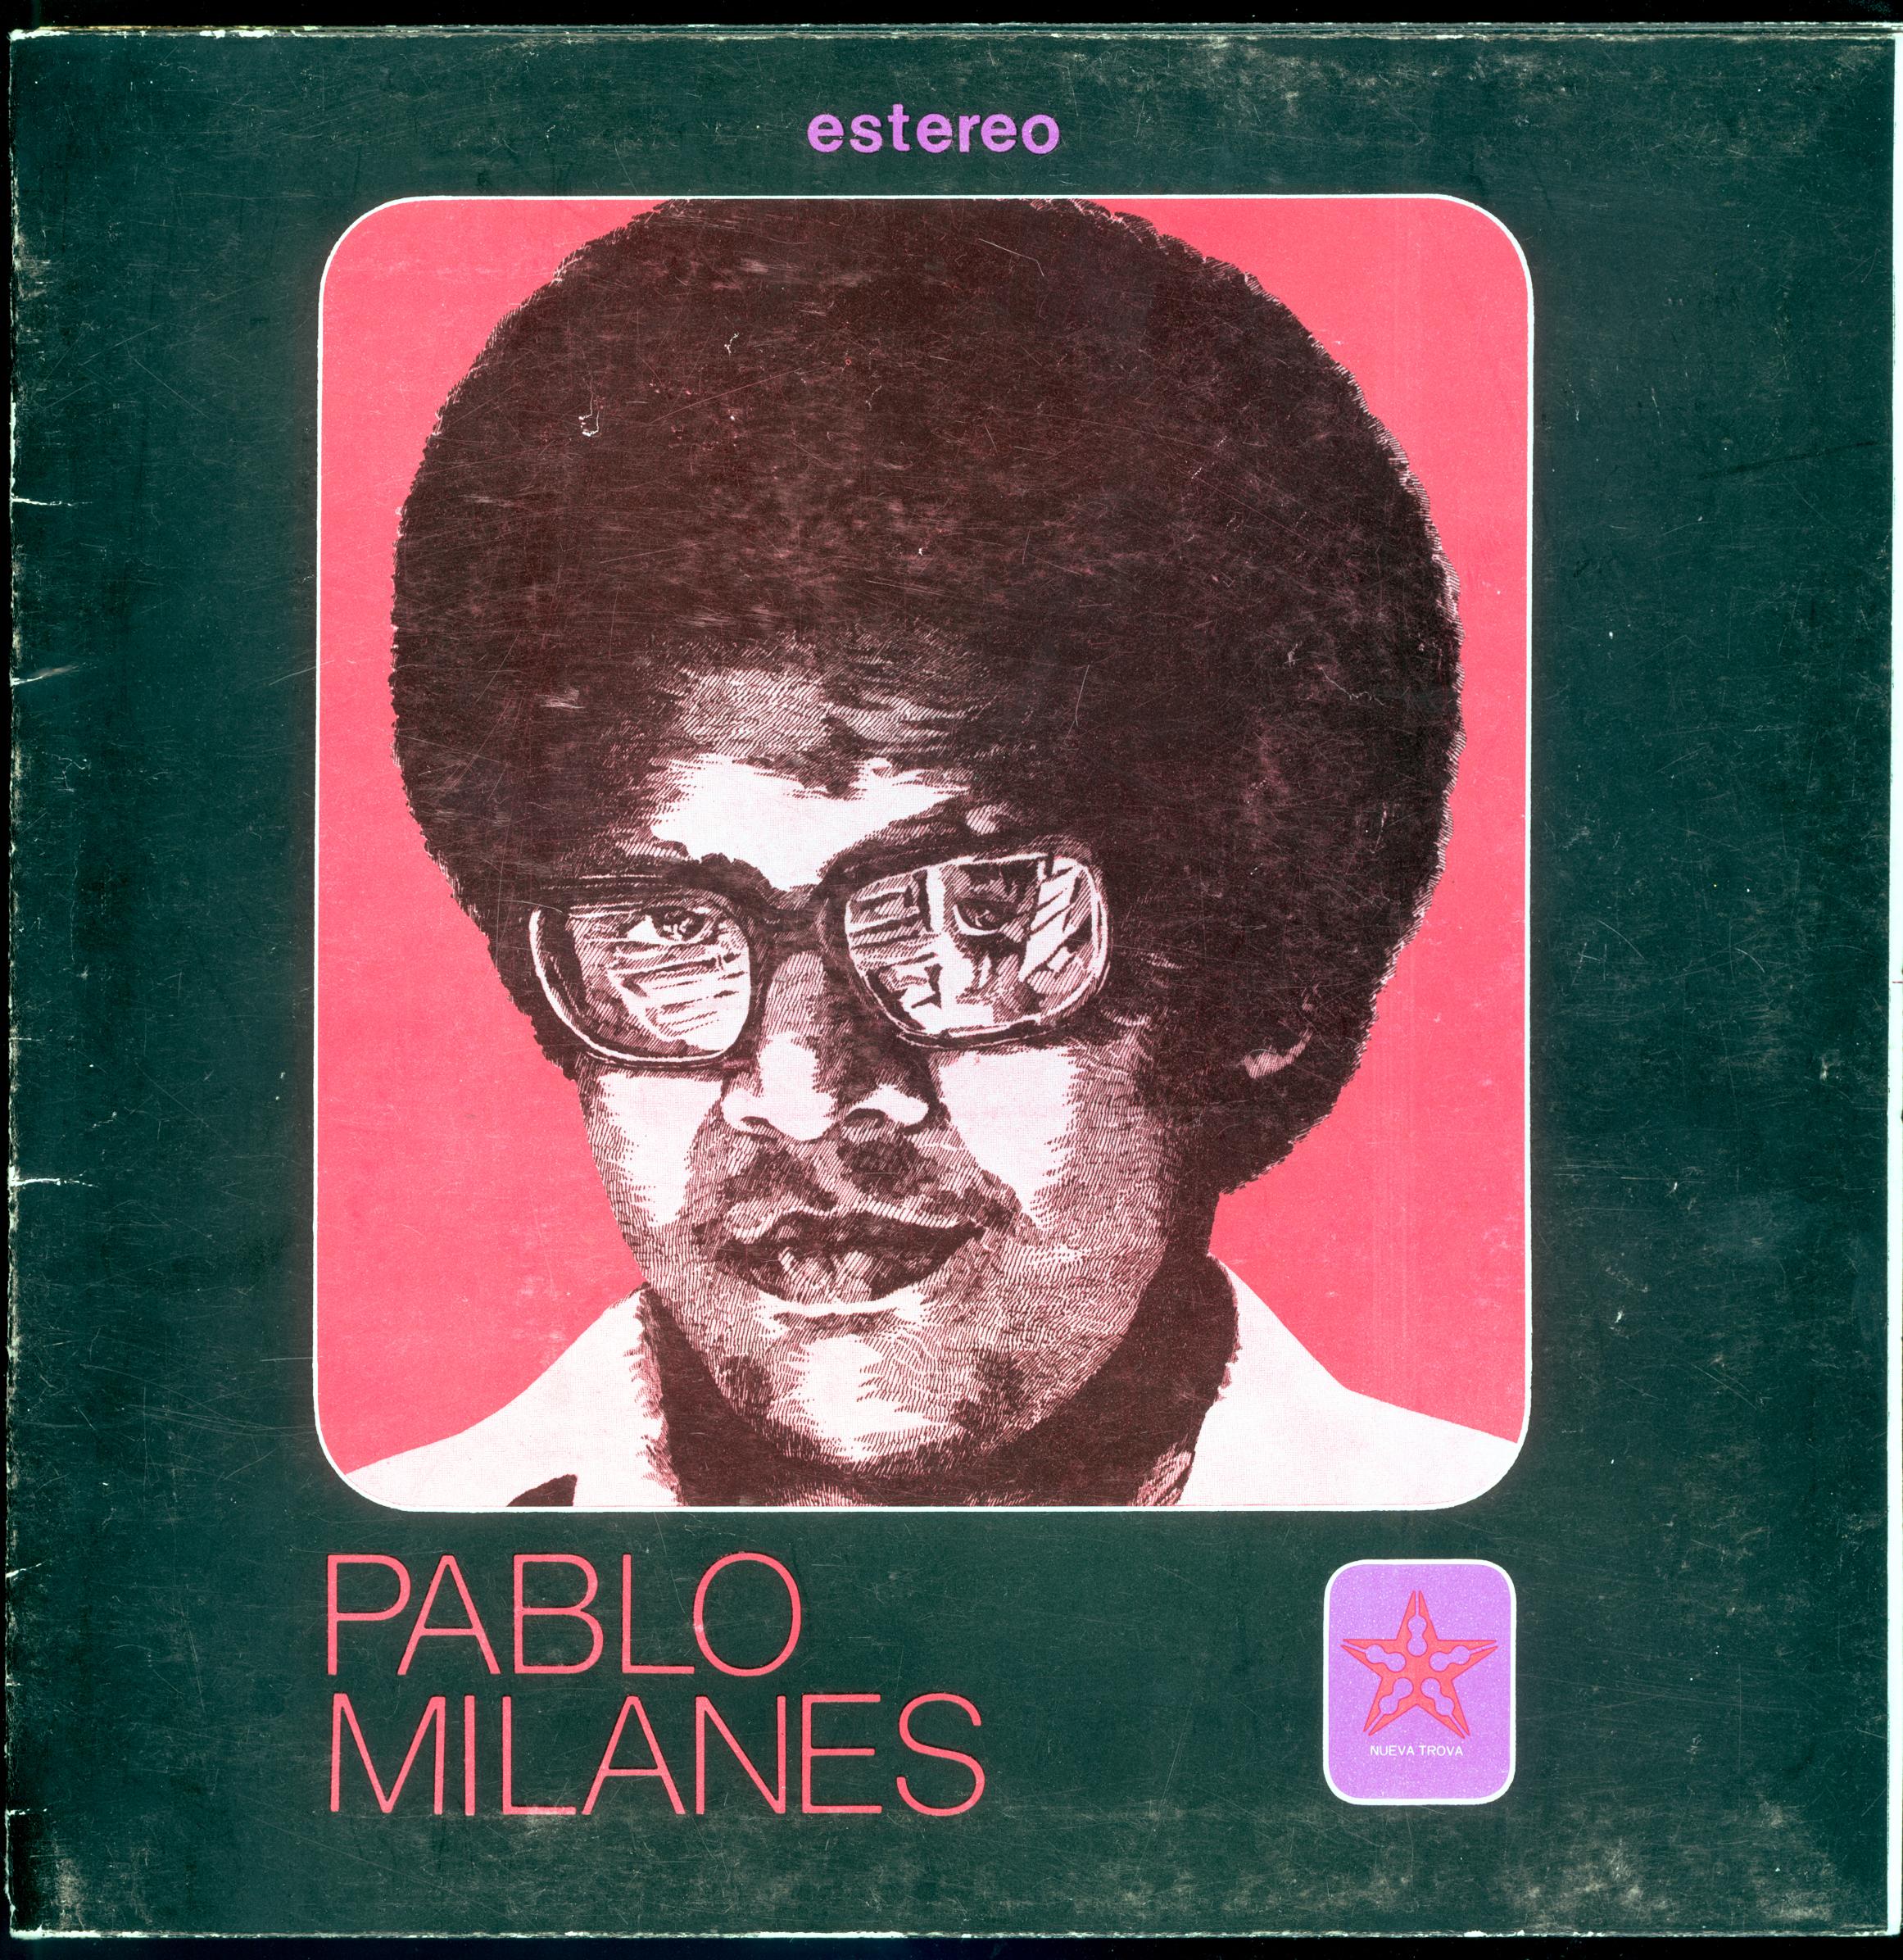 Pablo Milanes LP